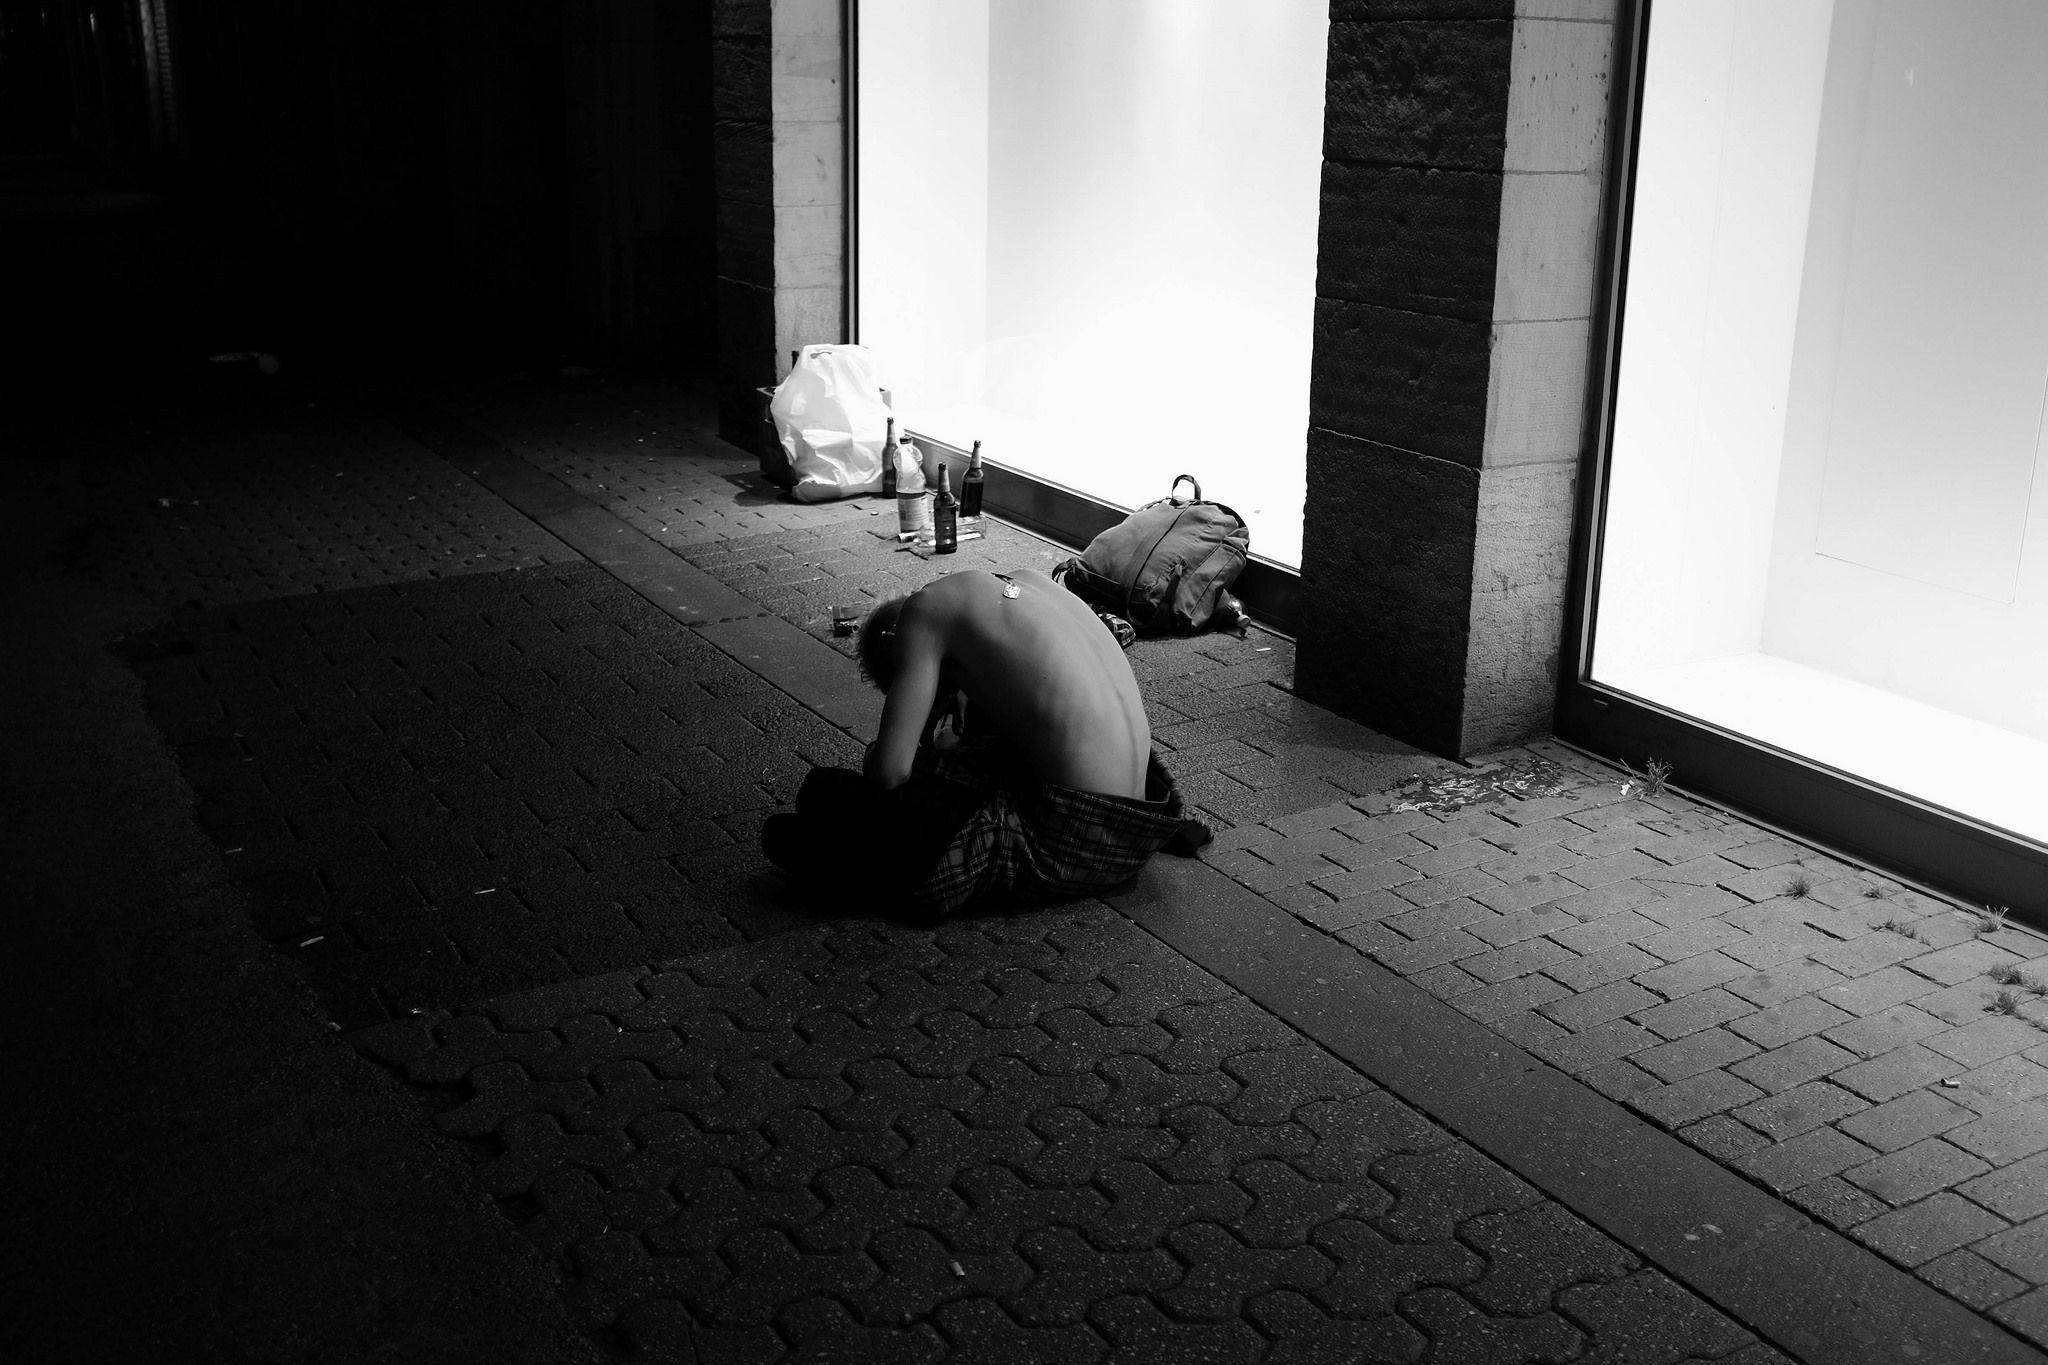 https://flic.kr/p/wMMwXk | Half Naked Sleeping Man in Düsseldorf. #streetphotography #street #photography #blackandwhite #photo